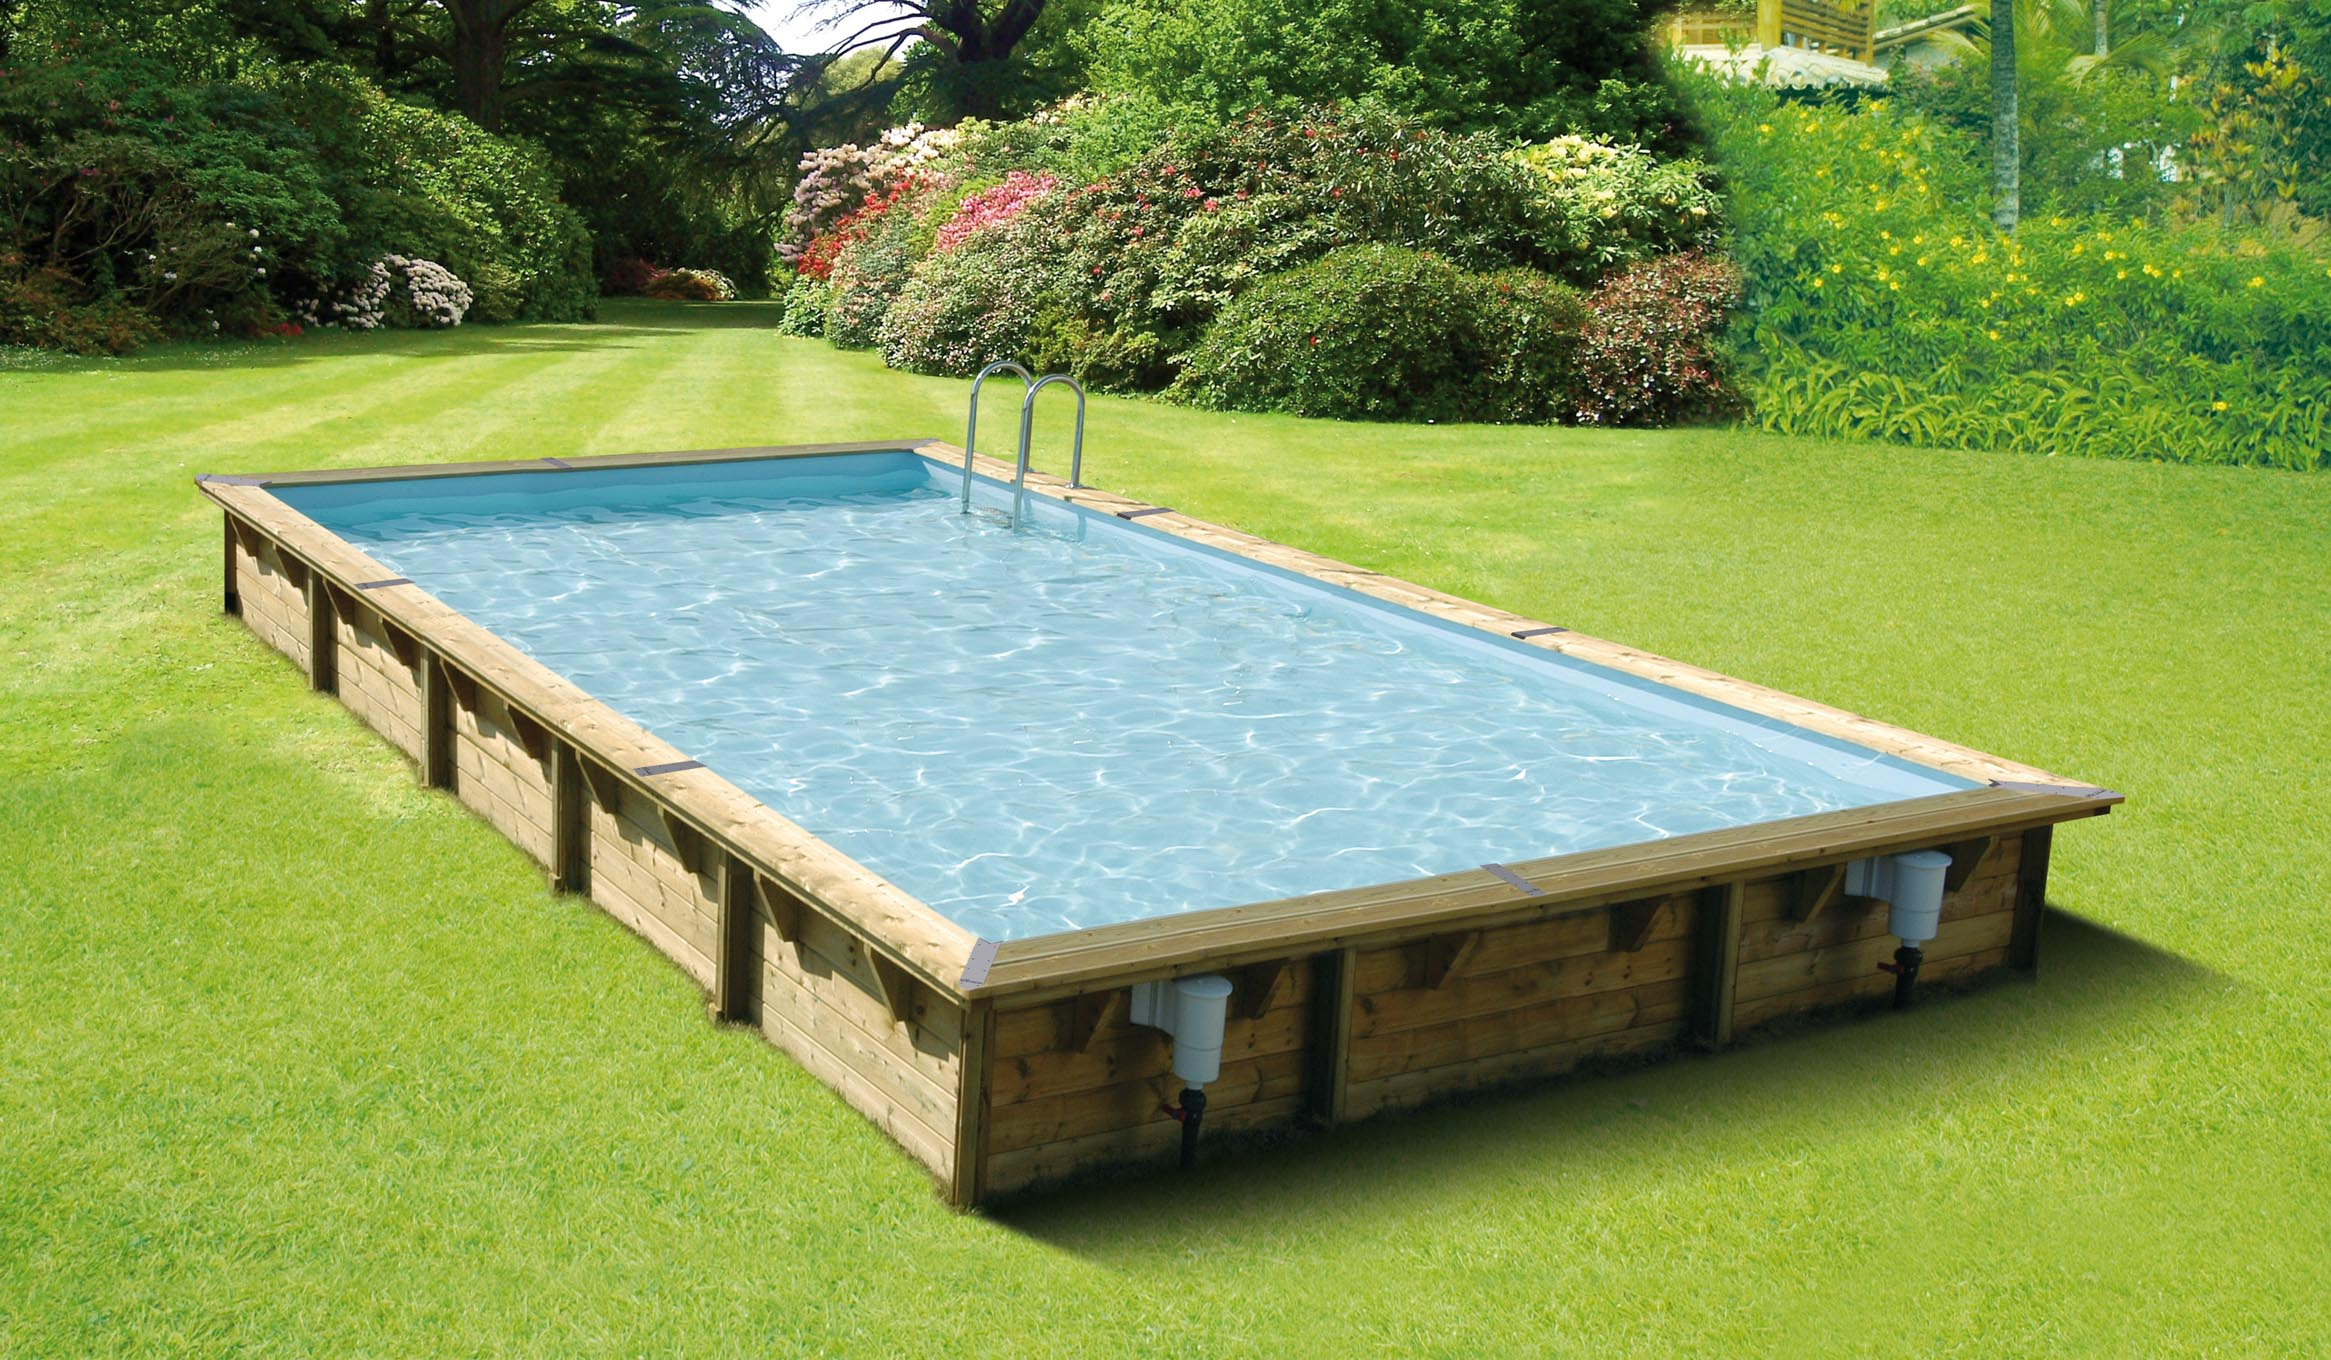 Piscina de madera 800cm x 500cm x 140cm piscinas athena - Piscina madera rectangular ...